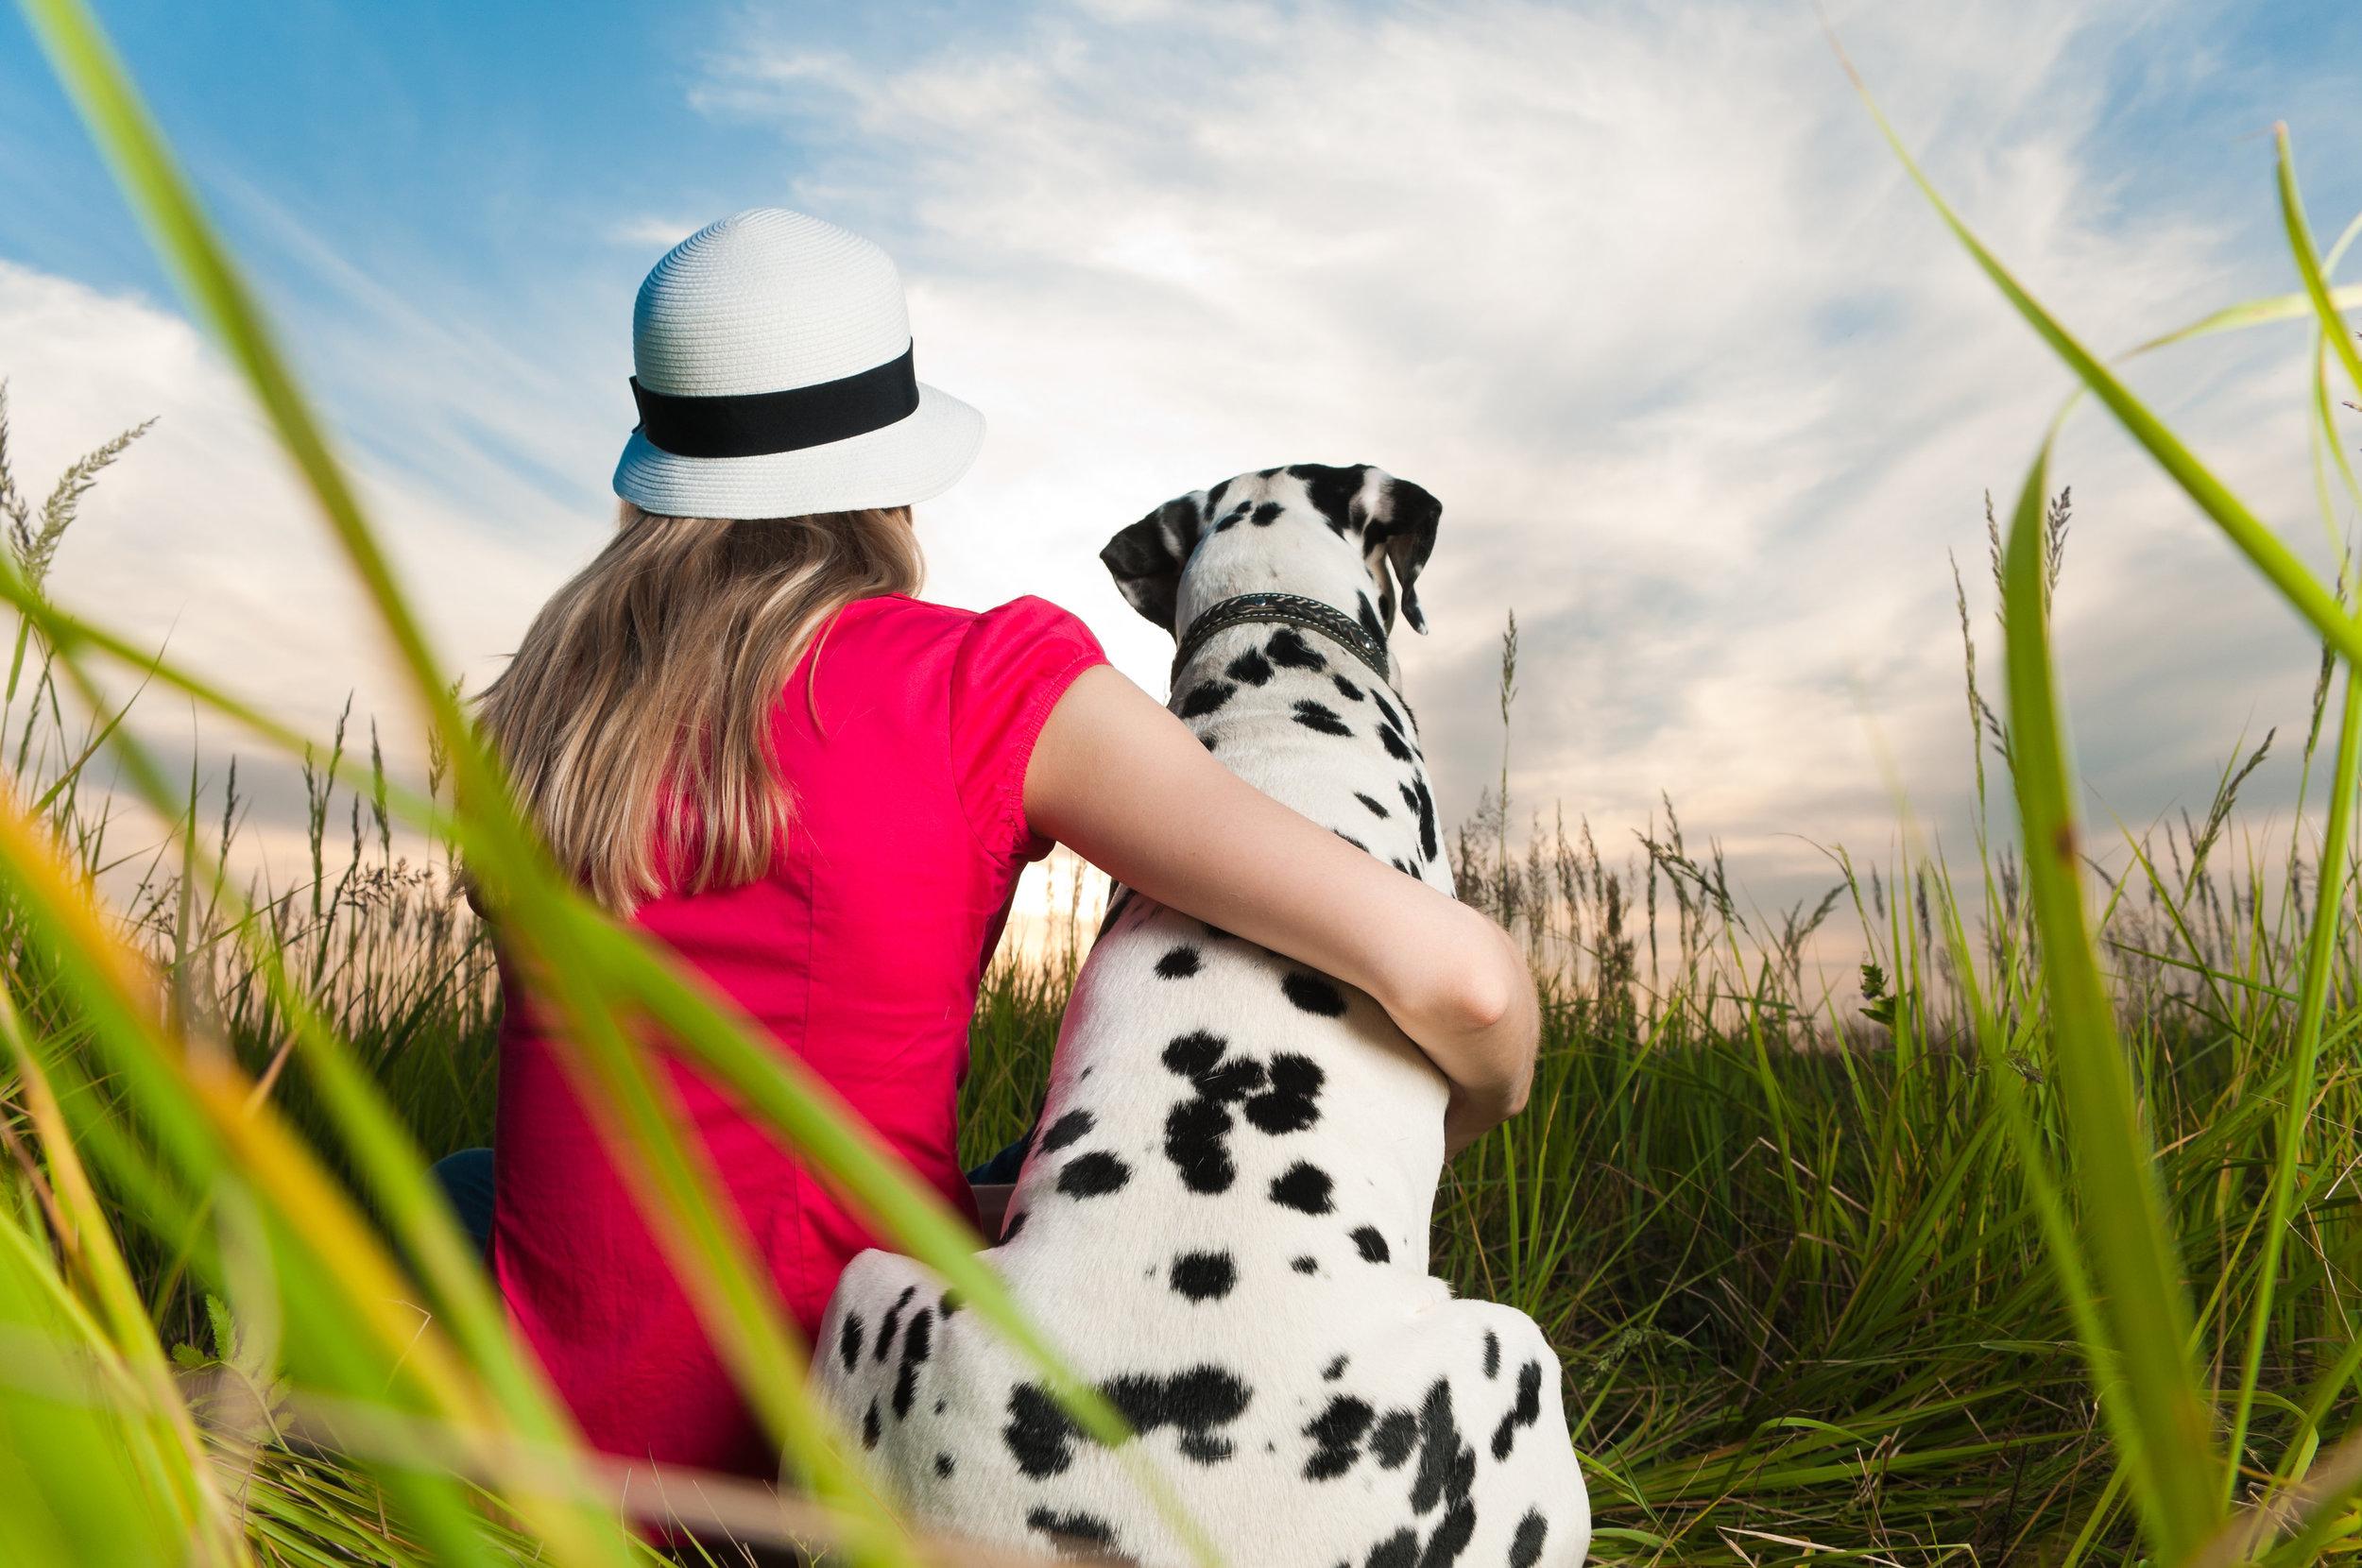 The loss of an animal companion is a real loss. -